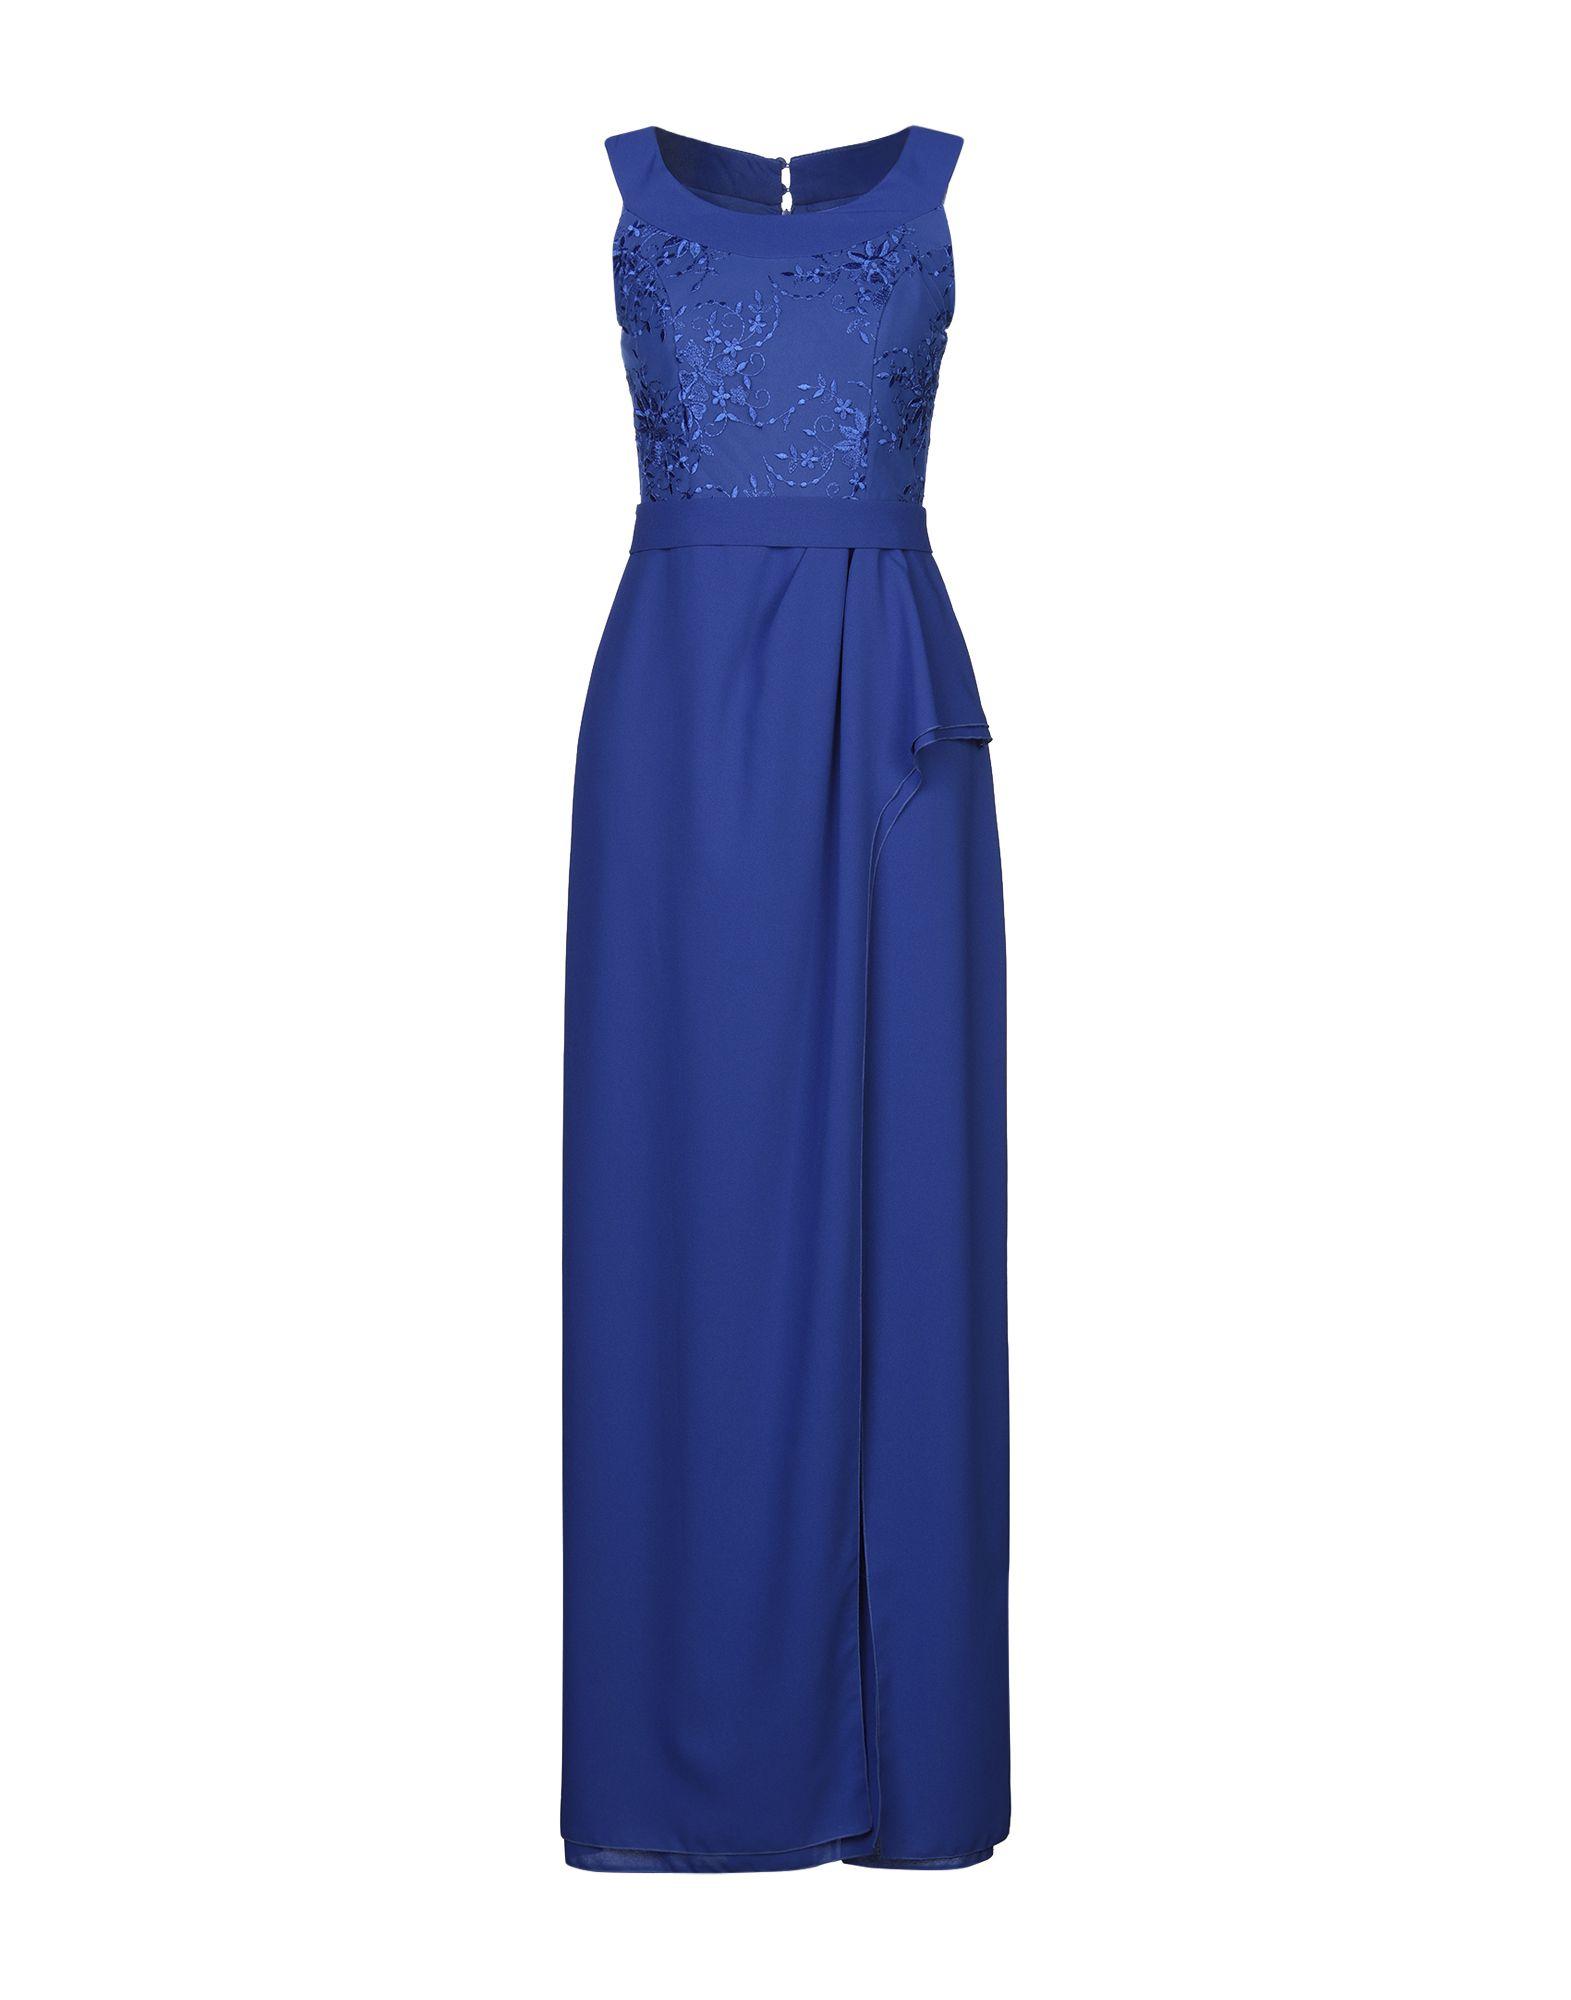 MONCHO HEREDIA Длинное платье moncho heredia платье длиной 3 4